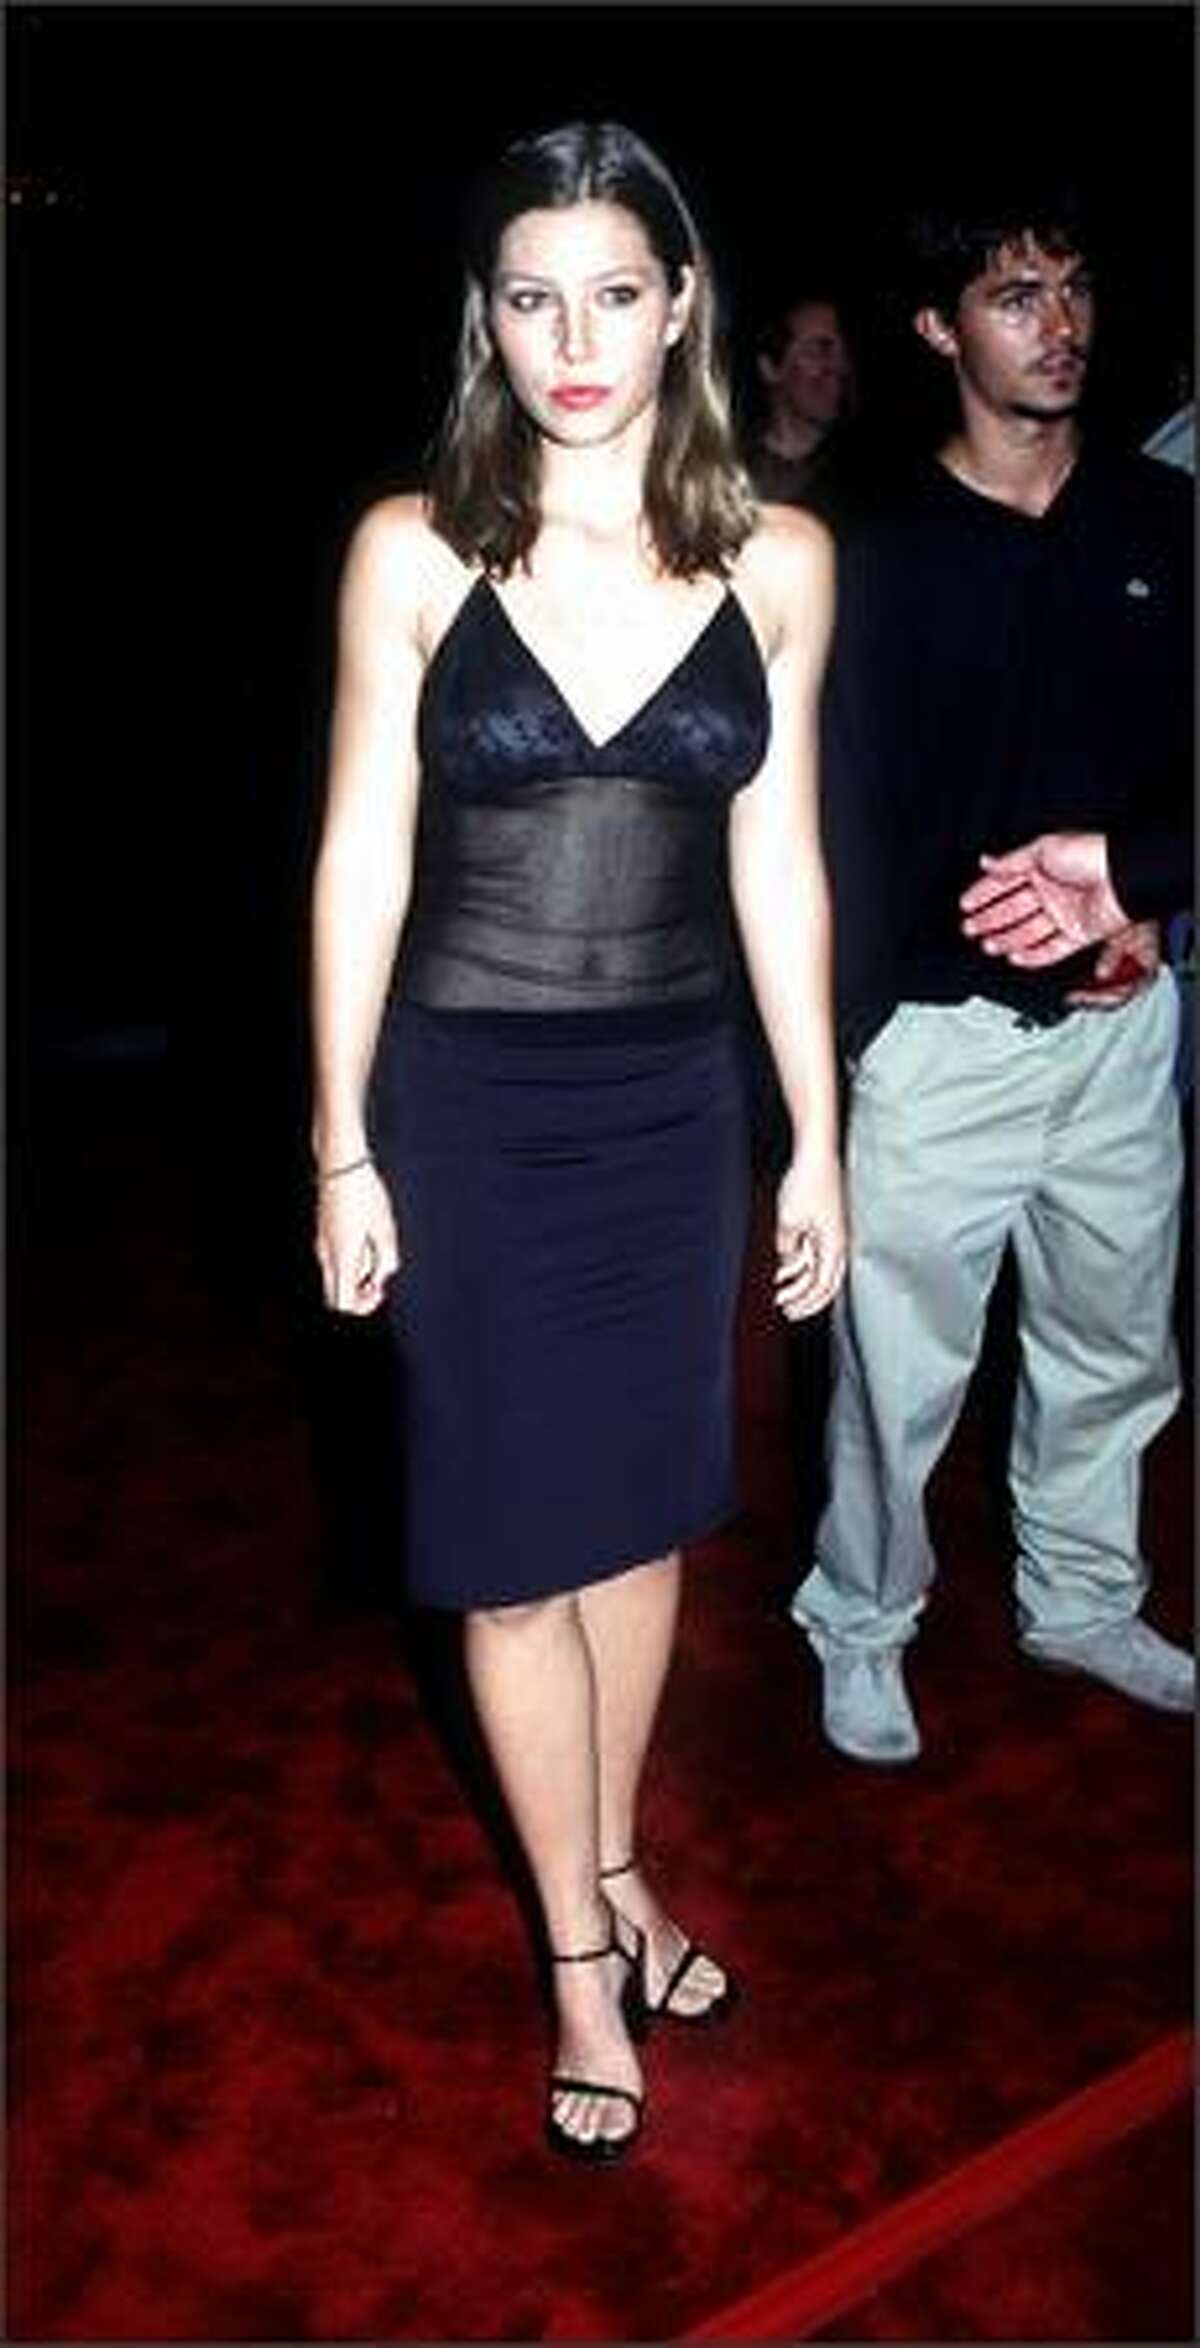 Jessica Biel at the premiere of